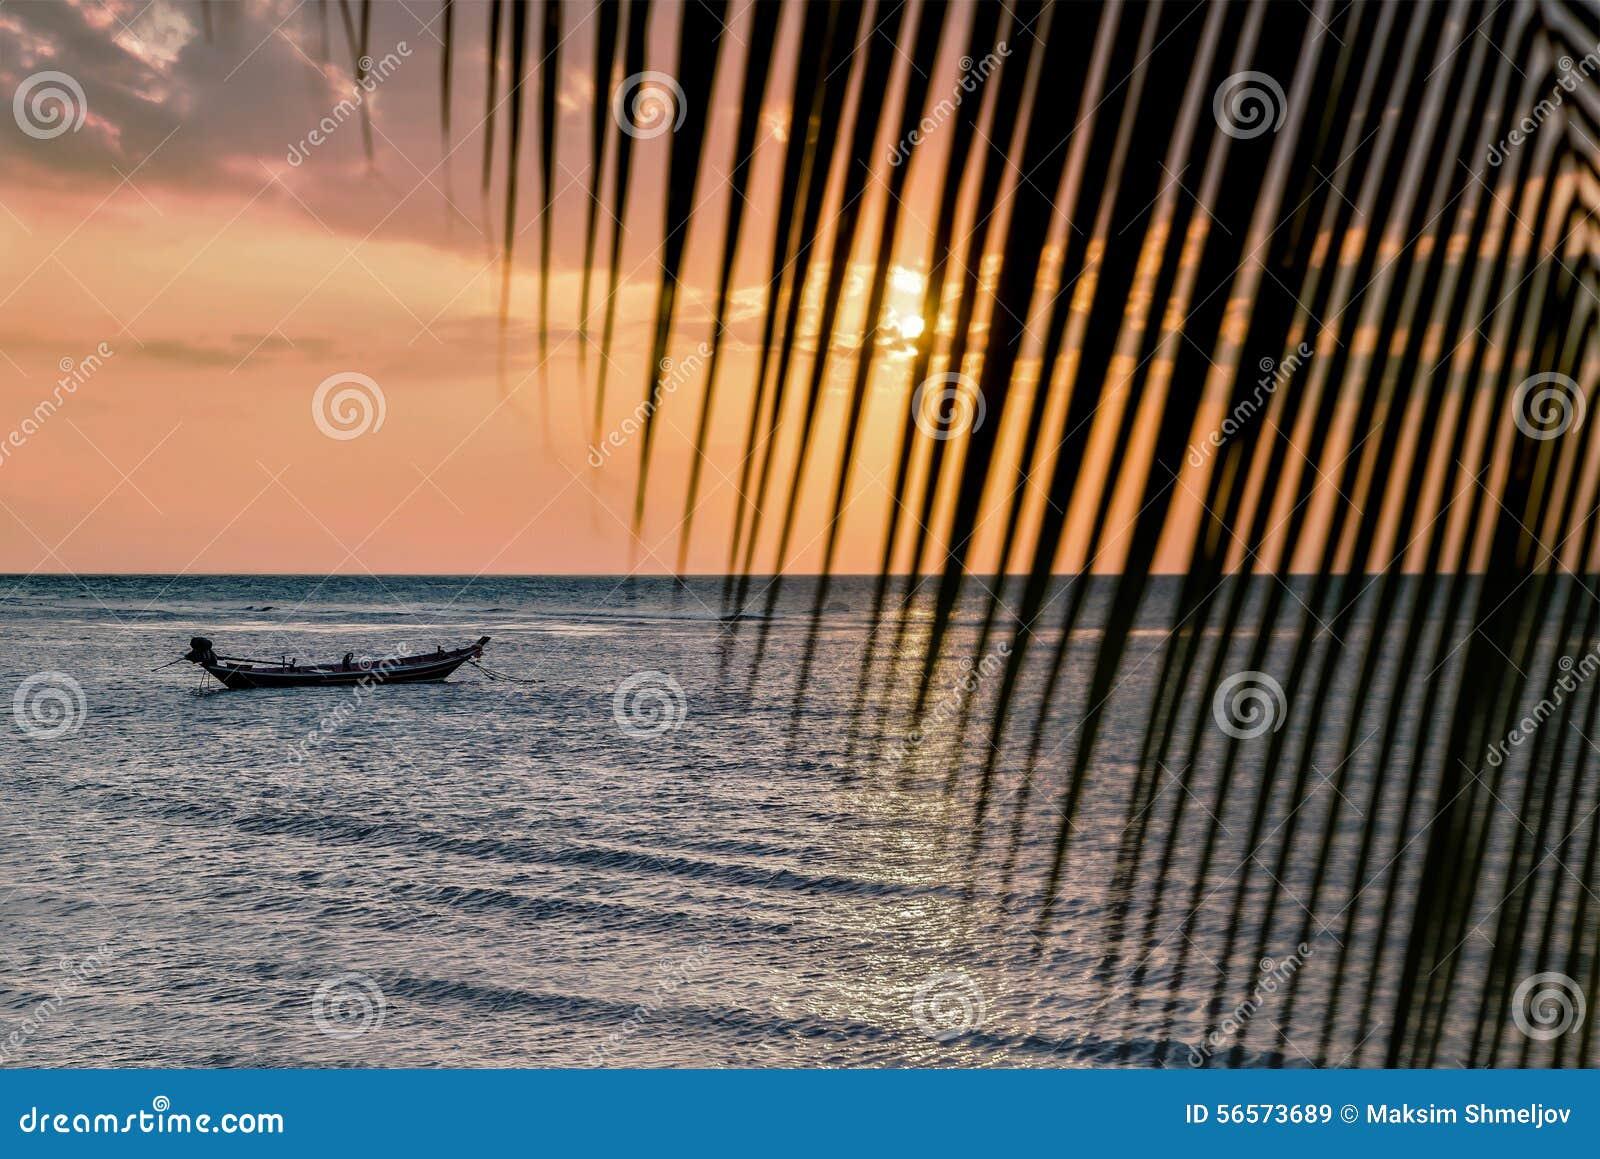 Download Όμορφη άποψη του ηλιοβασιλέματος στην παραλία Φοίνικας και βάρκες σε ένα φως του ήλιου Στοκ Εικόνα - εικόνα από κλίμα, ασιατικός: 56573689